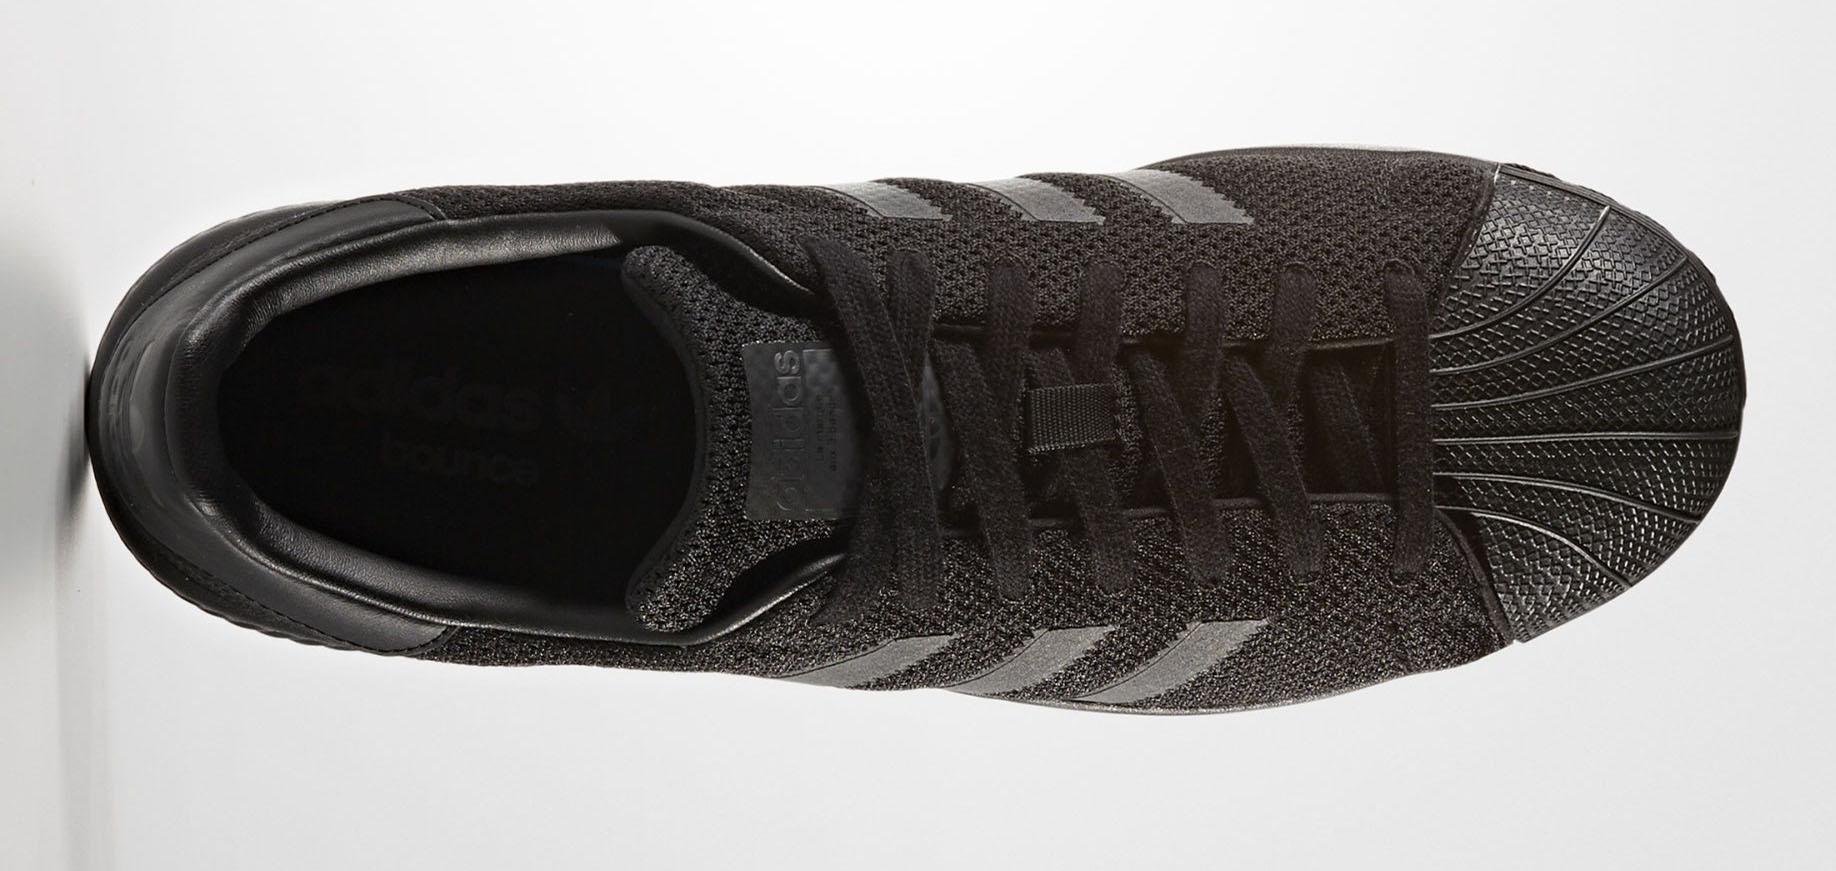 Adidas Superstar Bounce Triple Black